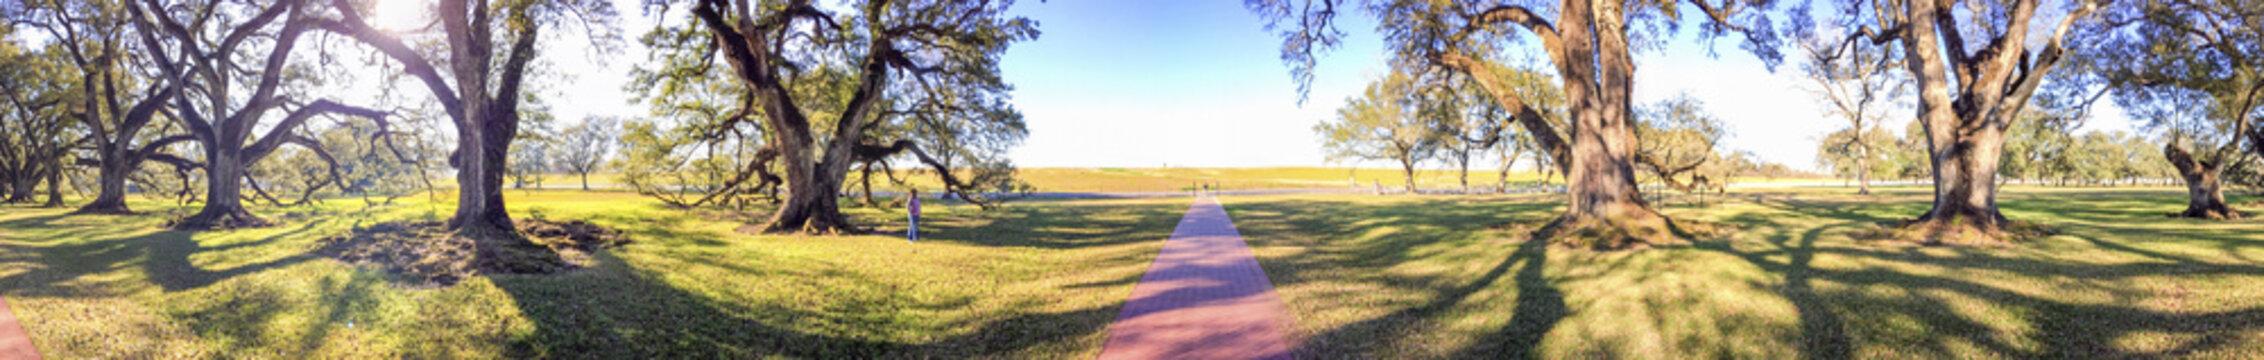 Oak Alley Plantation panoramic view, Louisiana